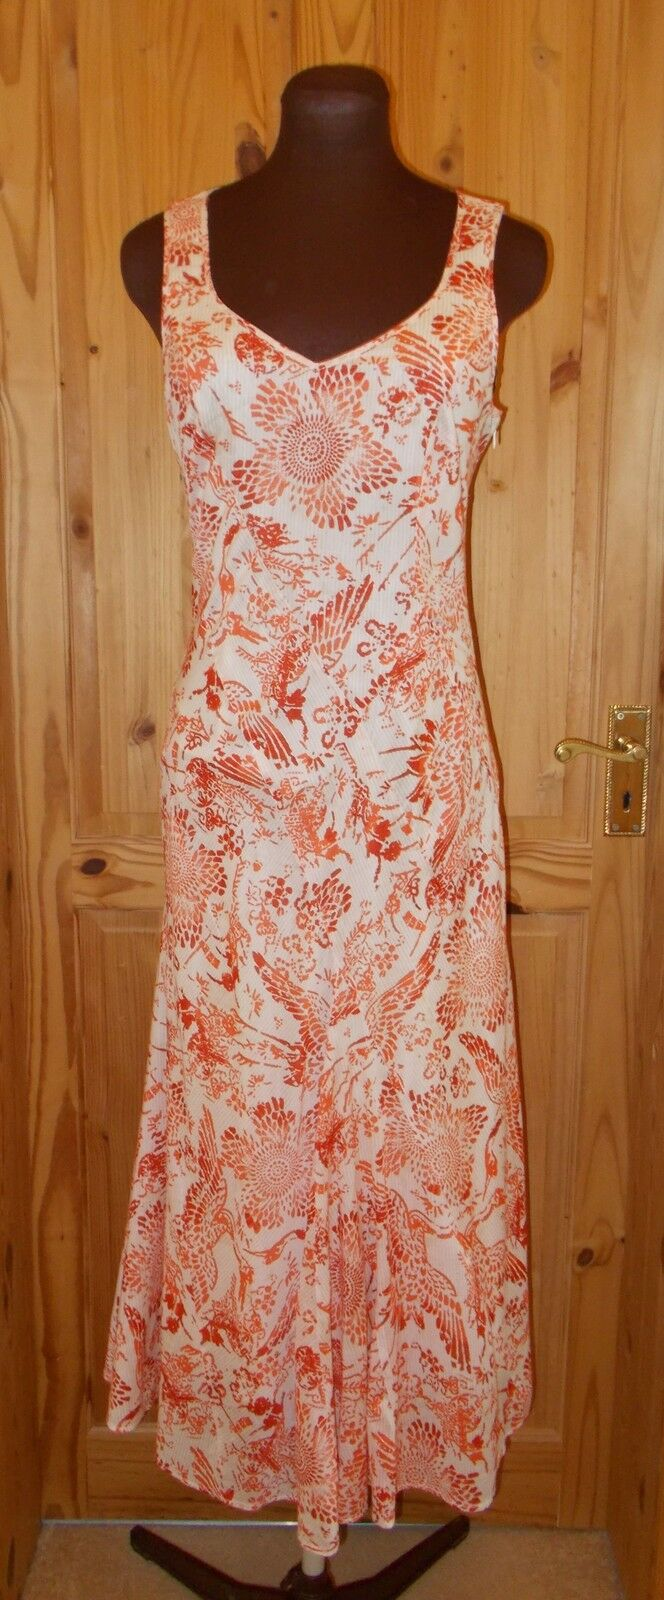 SANDWICH cream coral orange raspberry floral long summer holiday dress 36 8-10